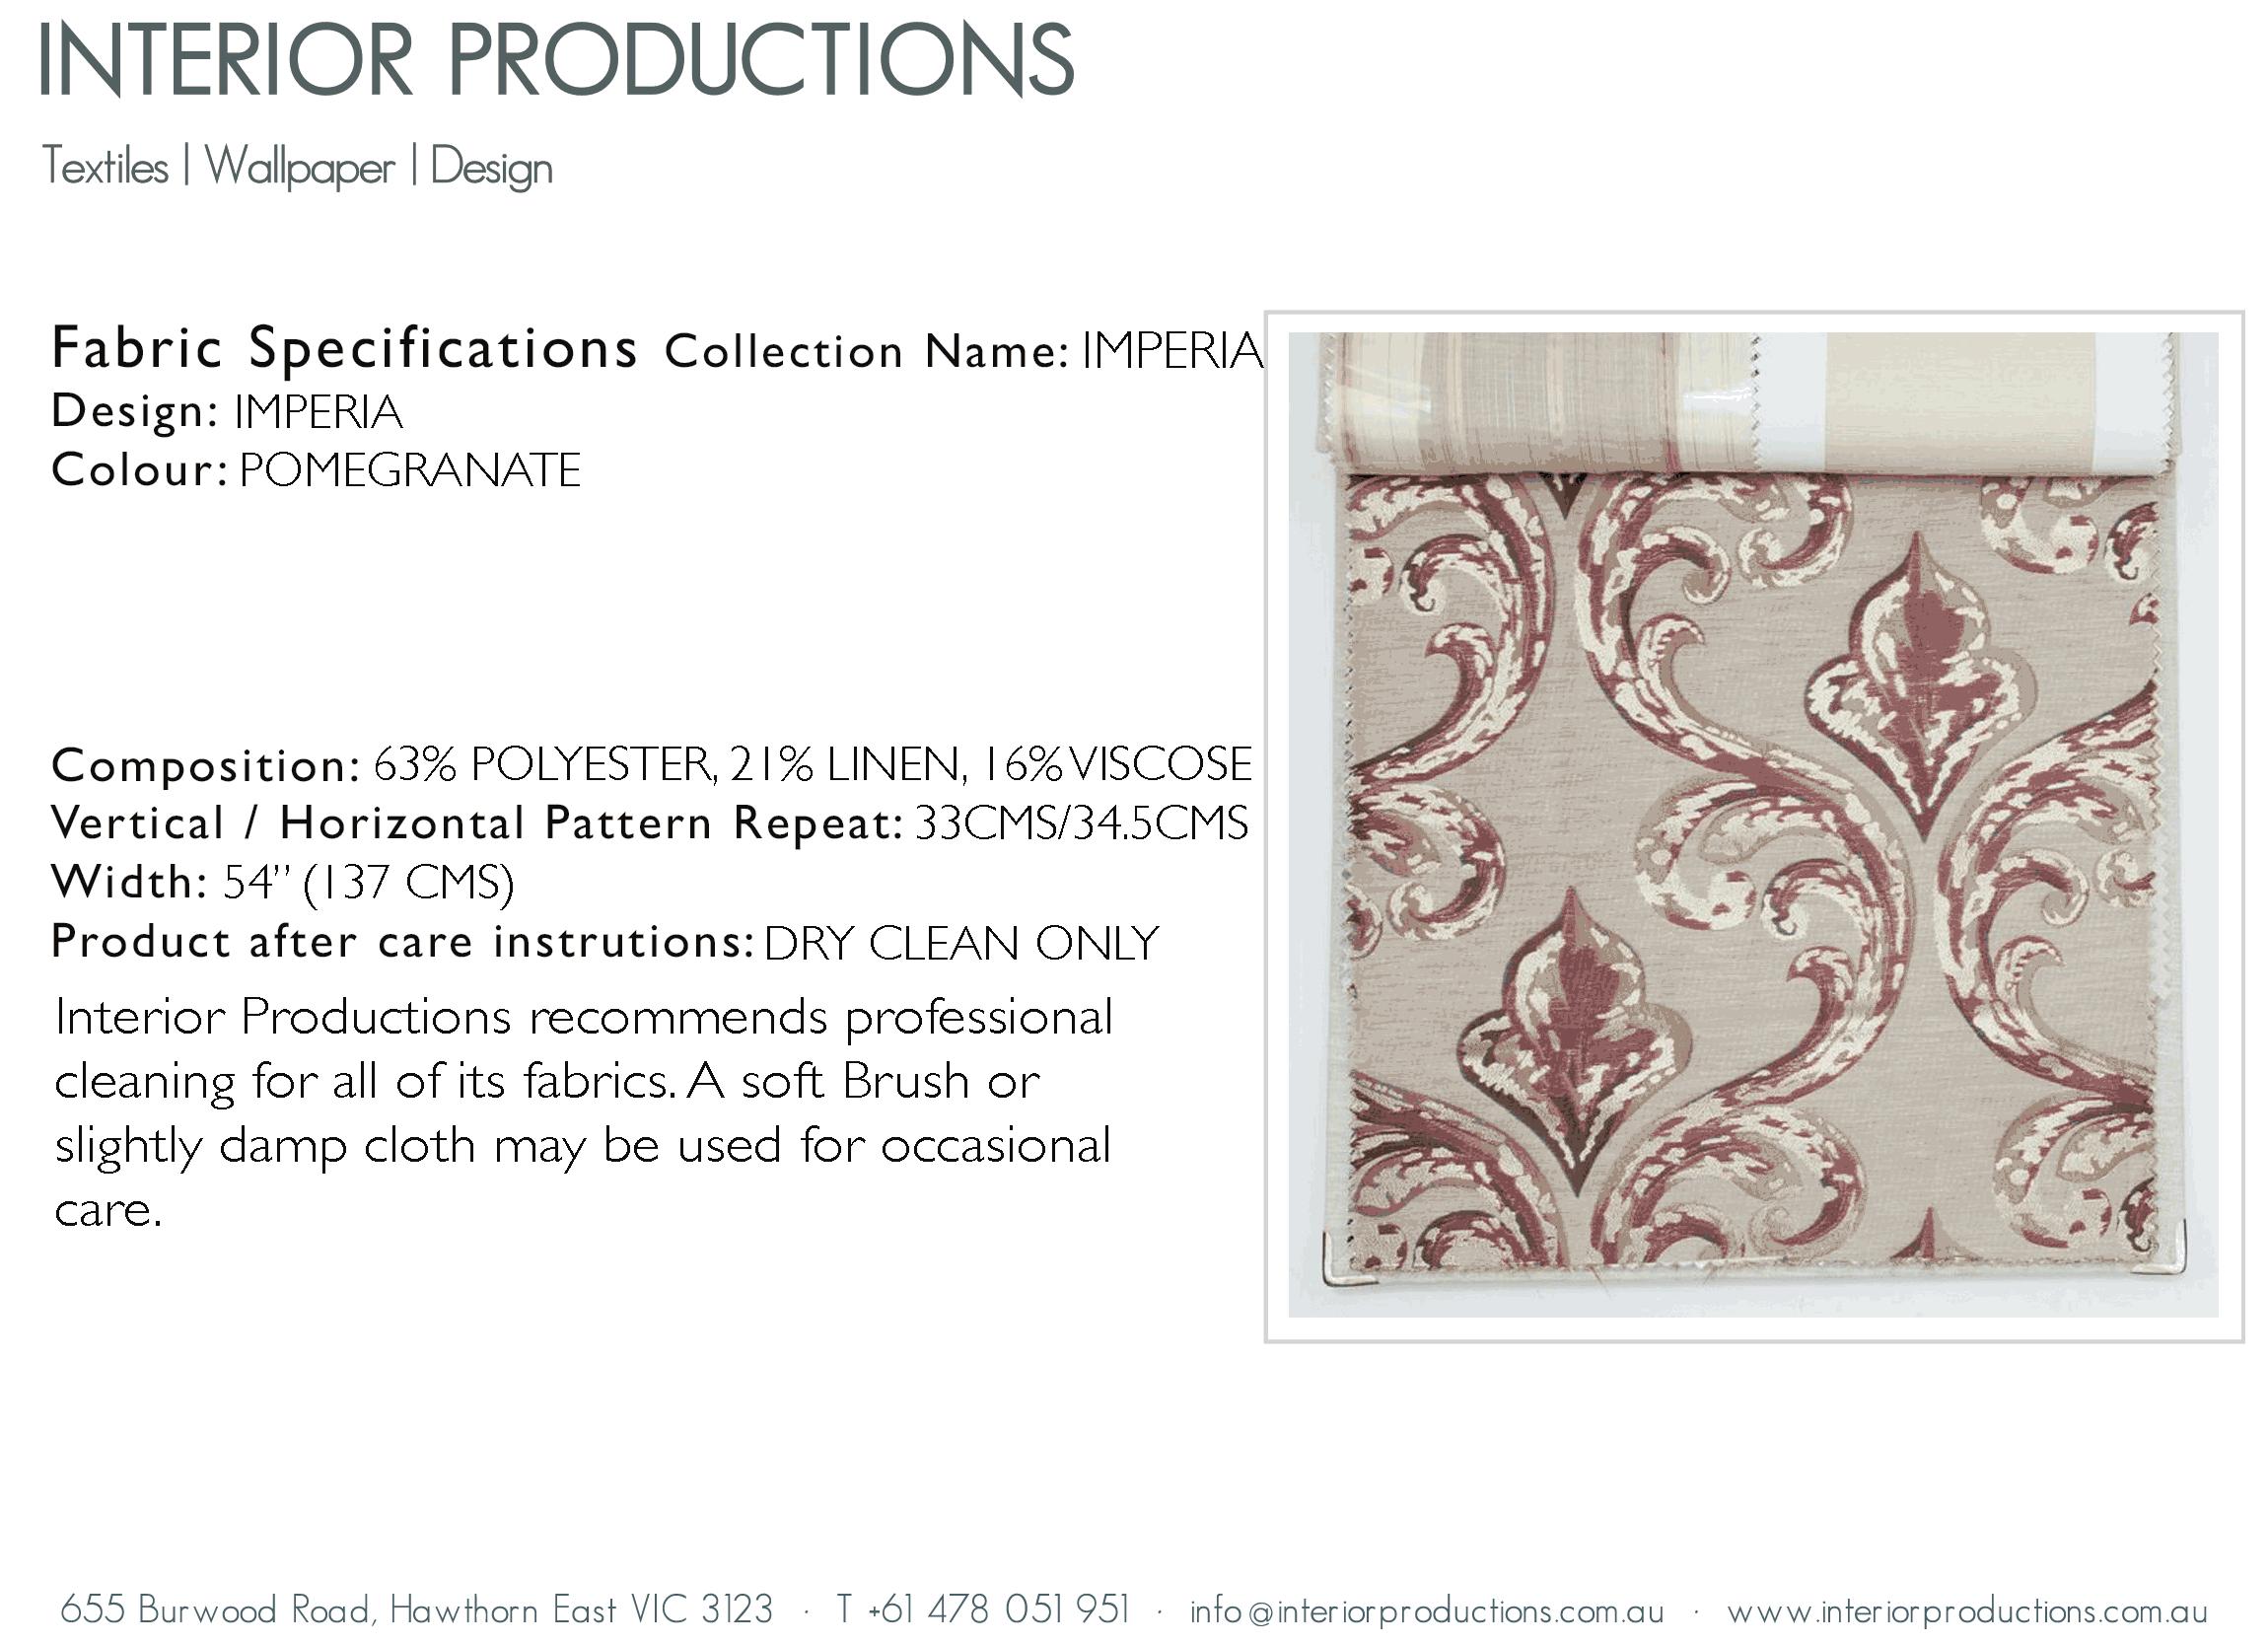 interior_productions_IMPERIA---POMEGRANATE